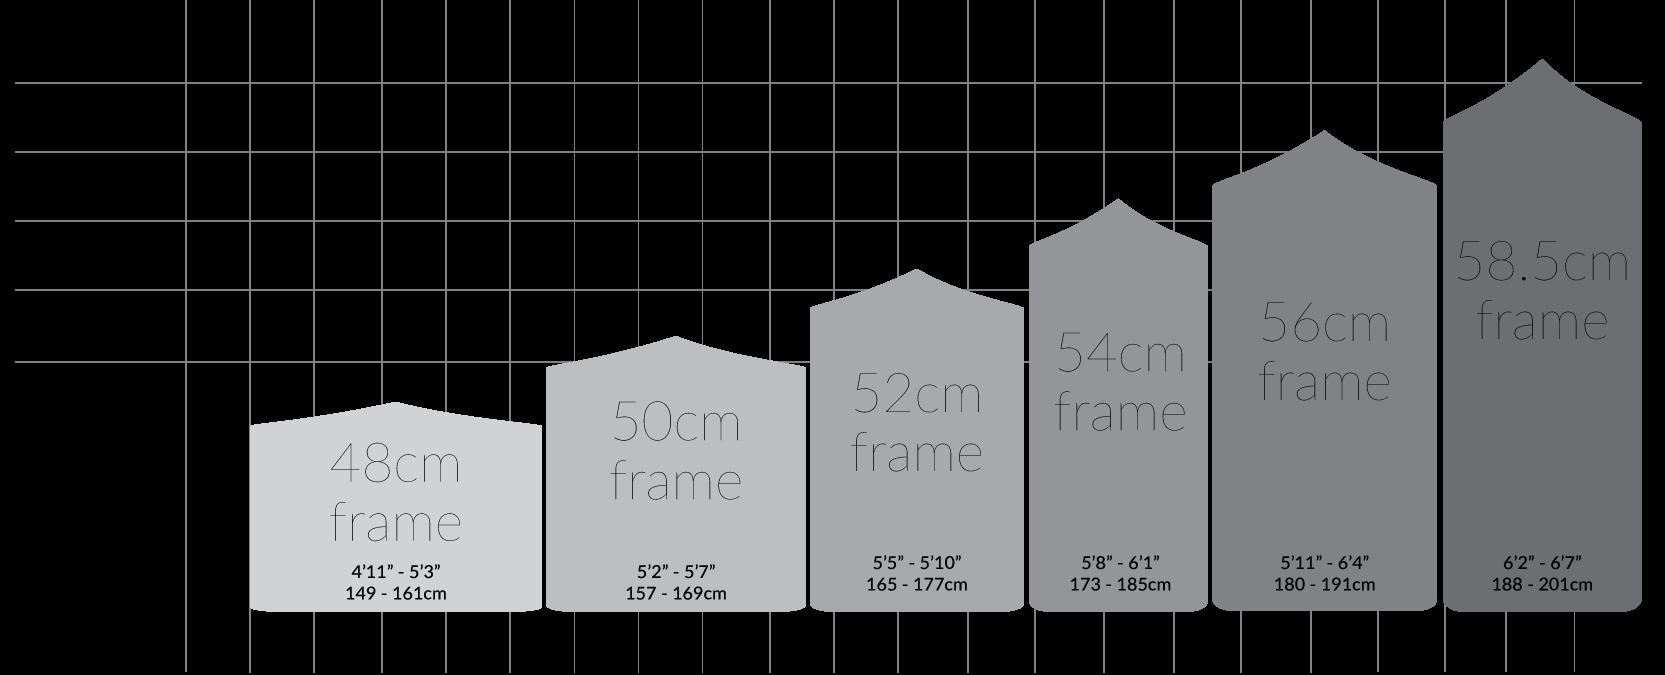 QR PR series size chart